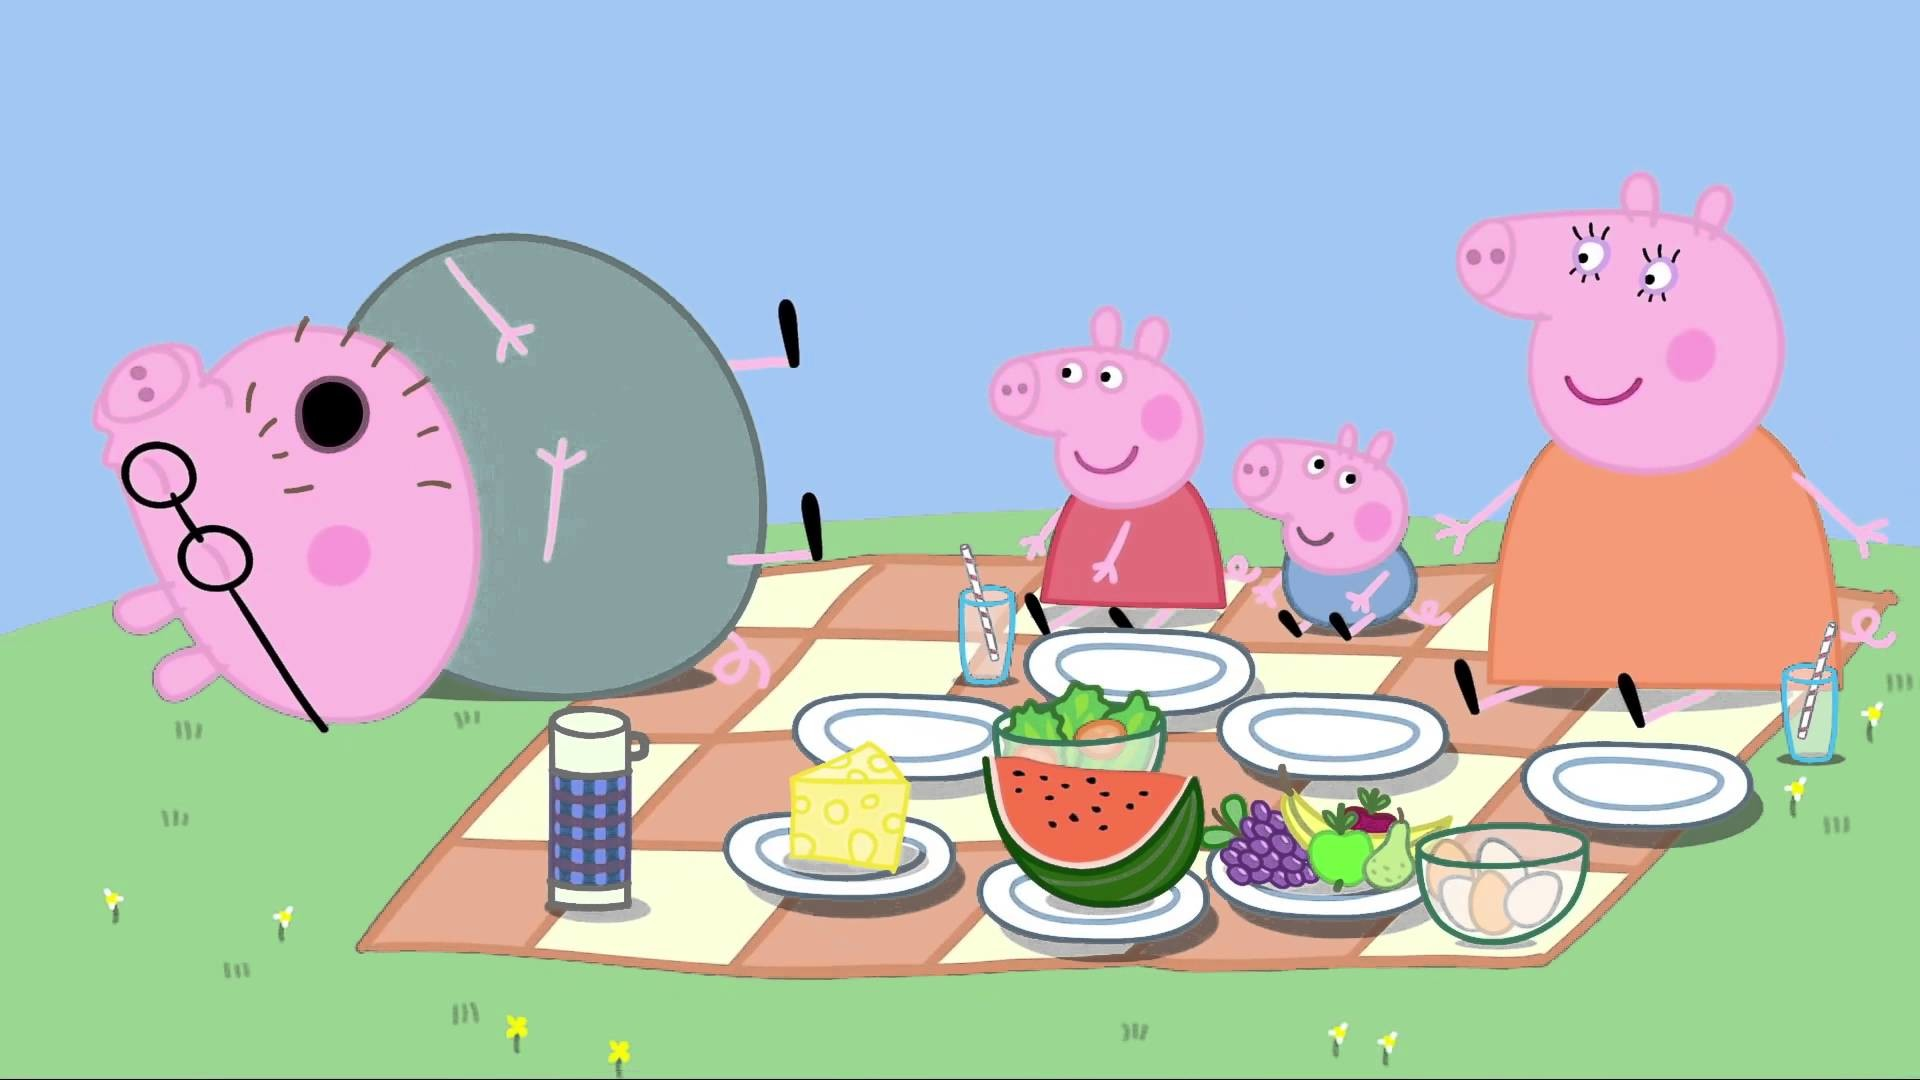 Peppa Pig: Picnic. Cartoons for Kids/Children